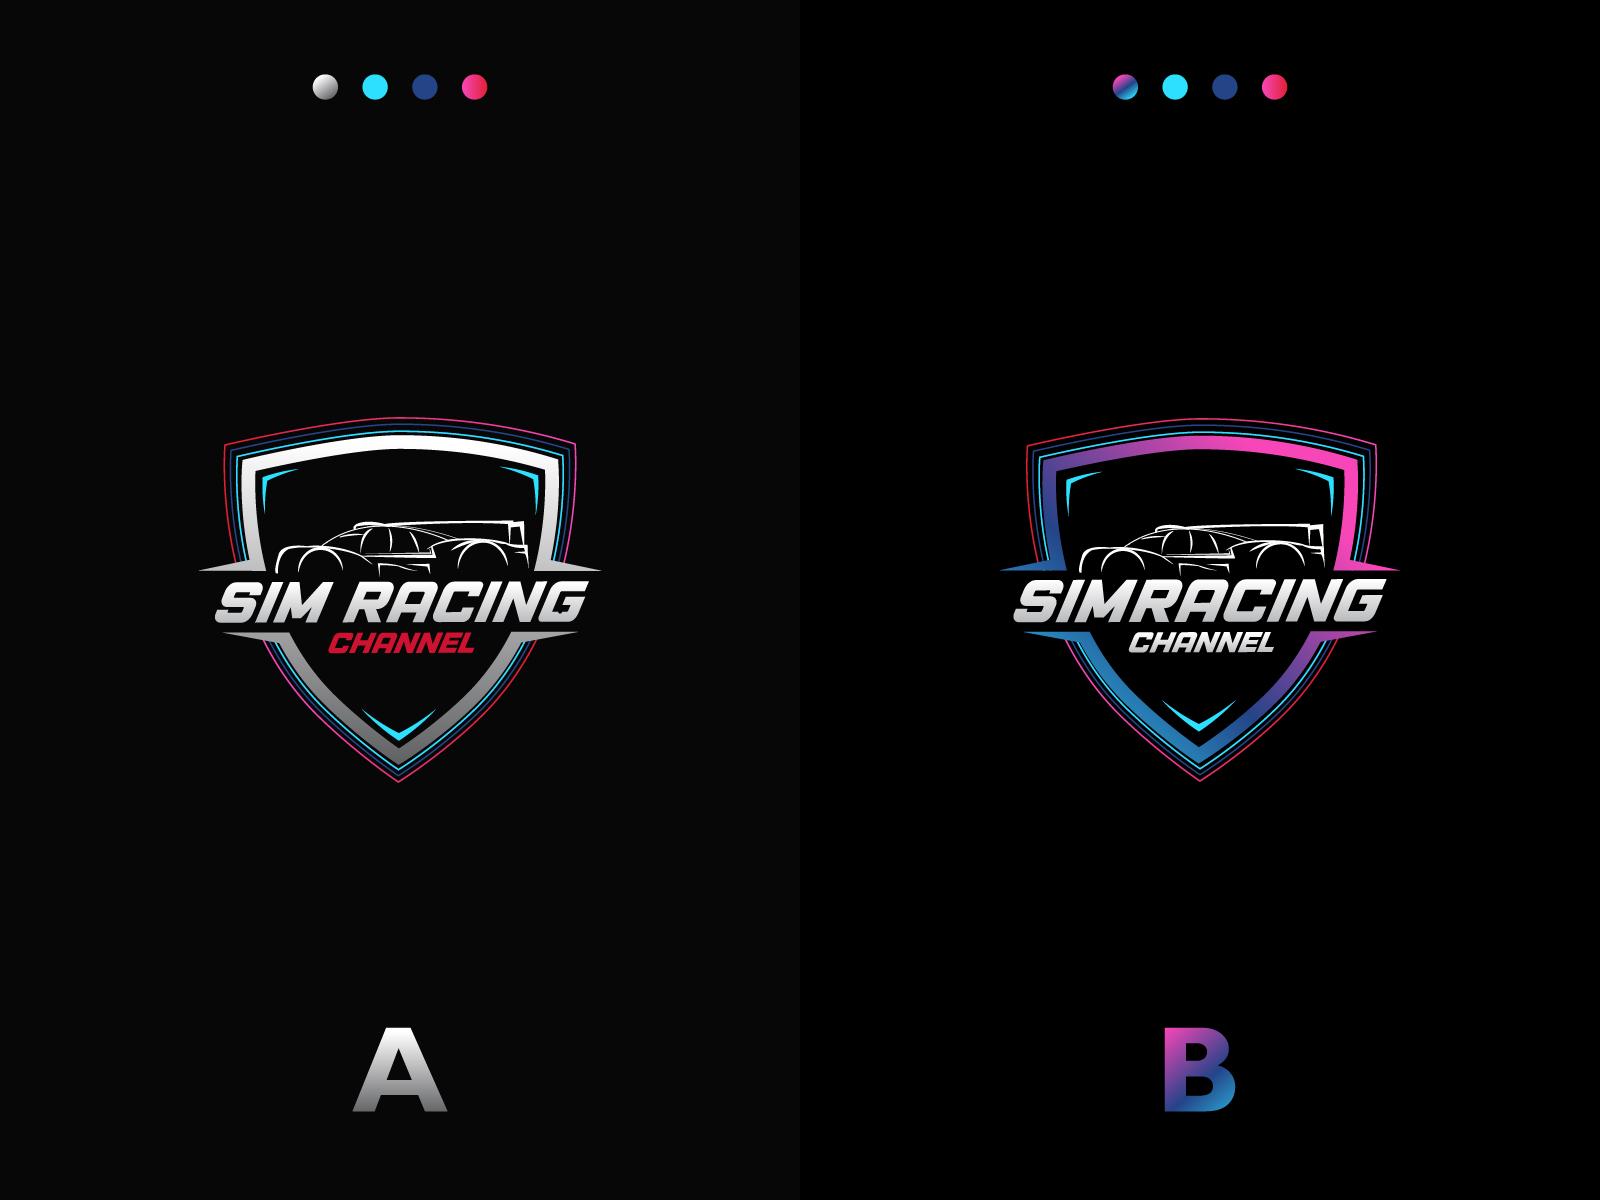 Sim racing channel logo design by rahalarts 02